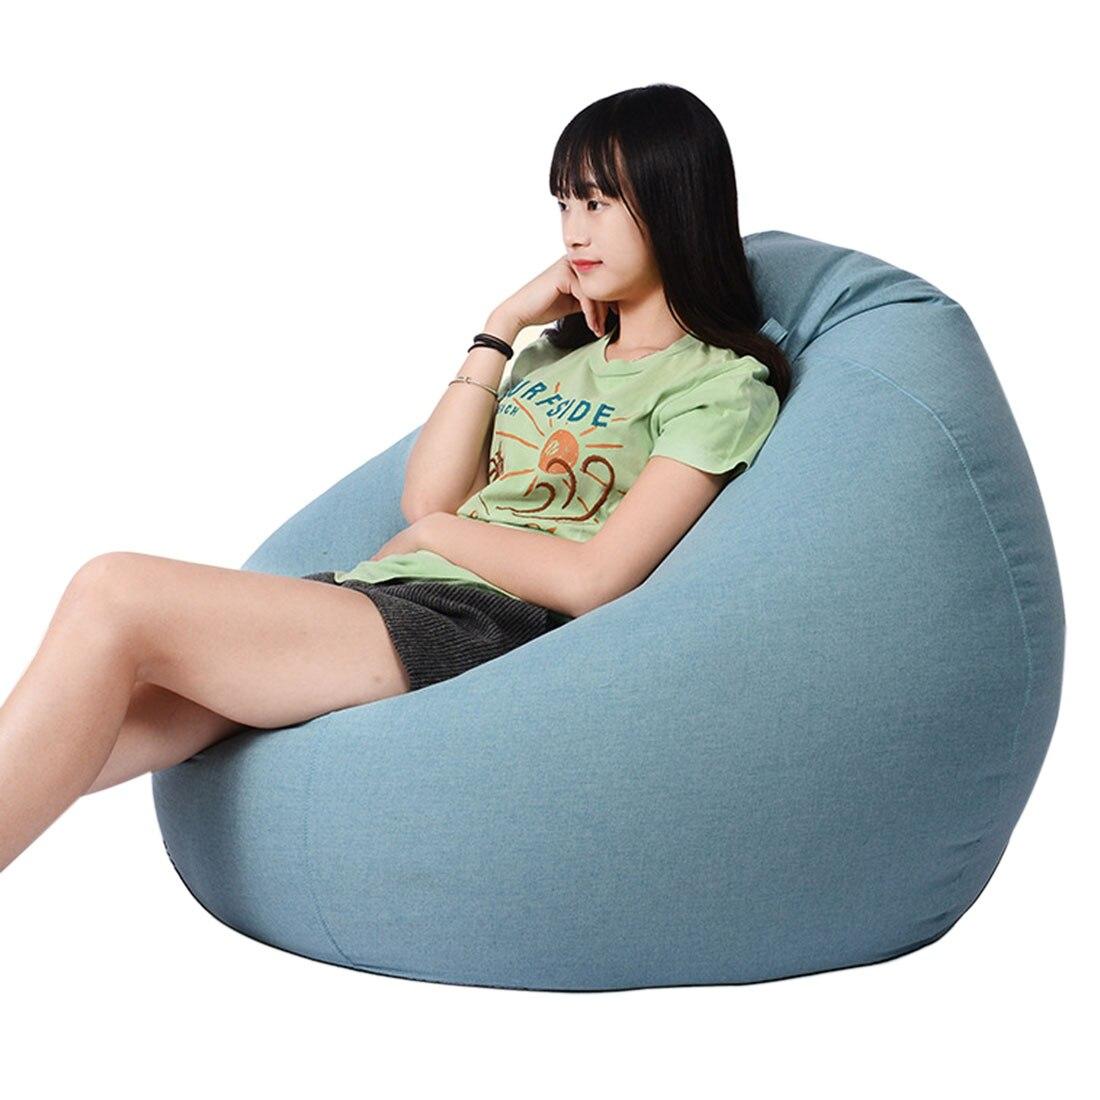 Terrific Volwassenen Kinderen Bean Bag Stoel Sofa Woonkamer Lounger Creativecarmelina Interior Chair Design Creativecarmelinacom